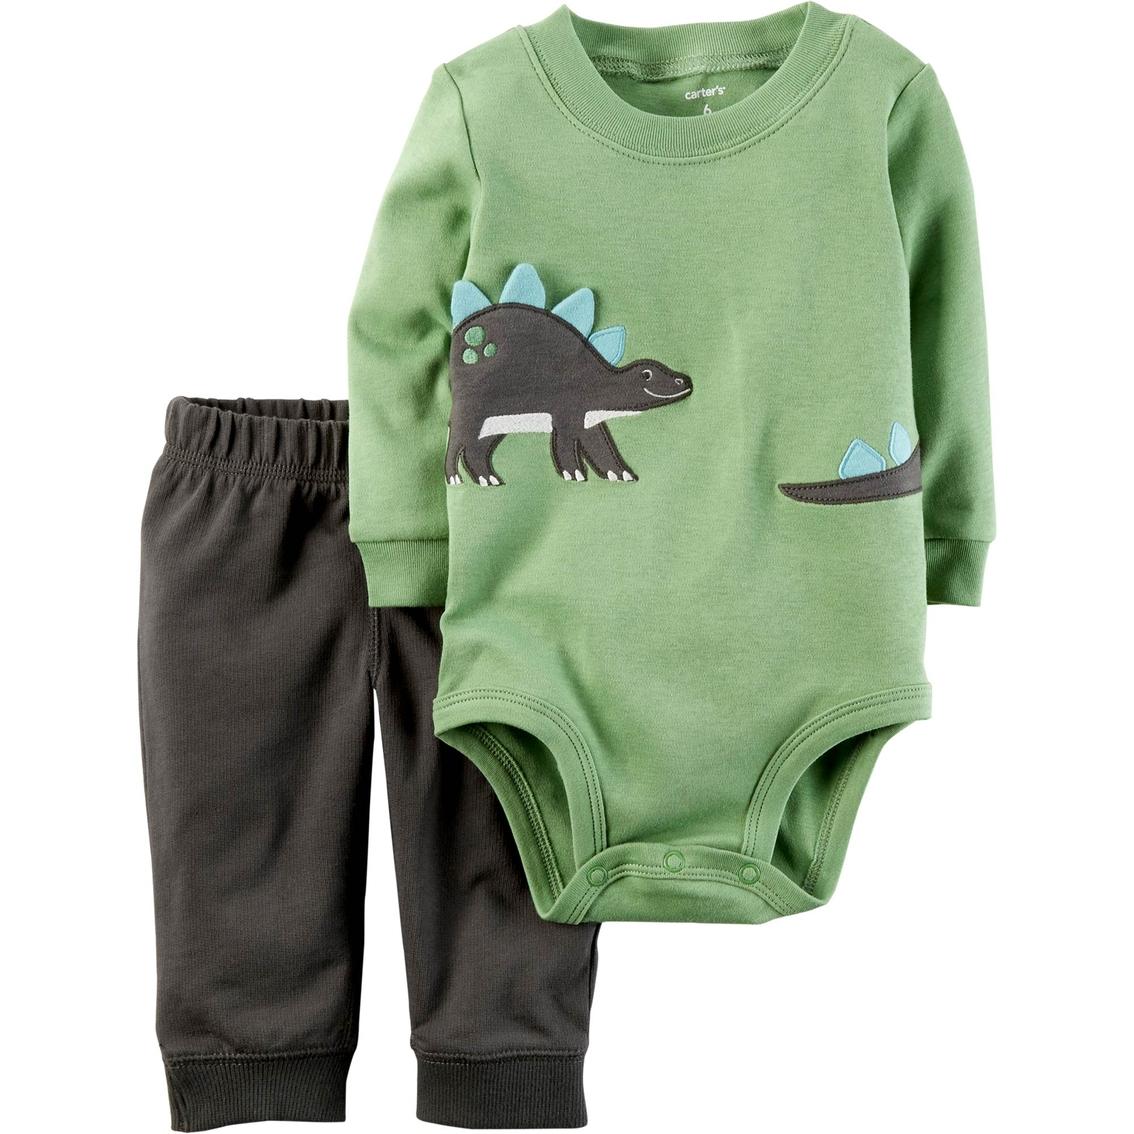 f889c3343 Carter s Infant Boys 2 Pc. Dino Pants Set